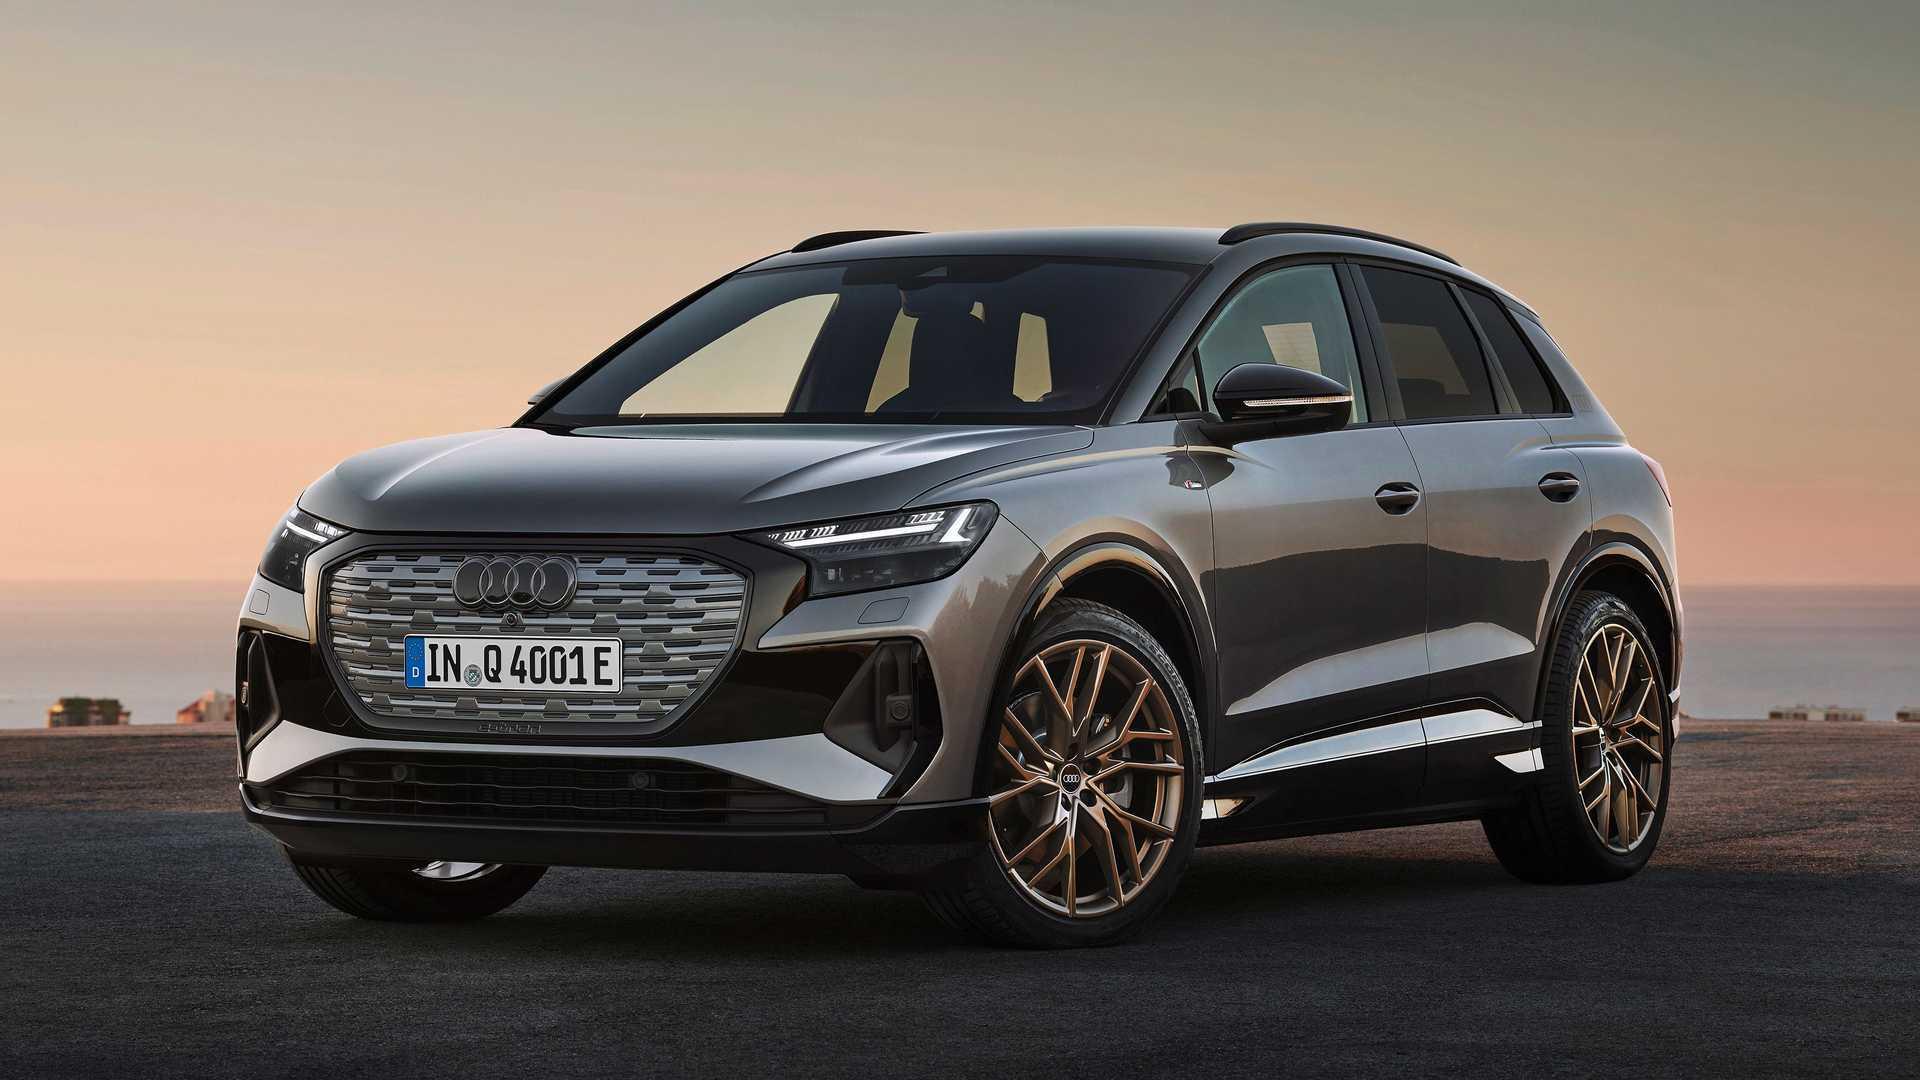 2022 Audi Q4 E-Tron Exterior